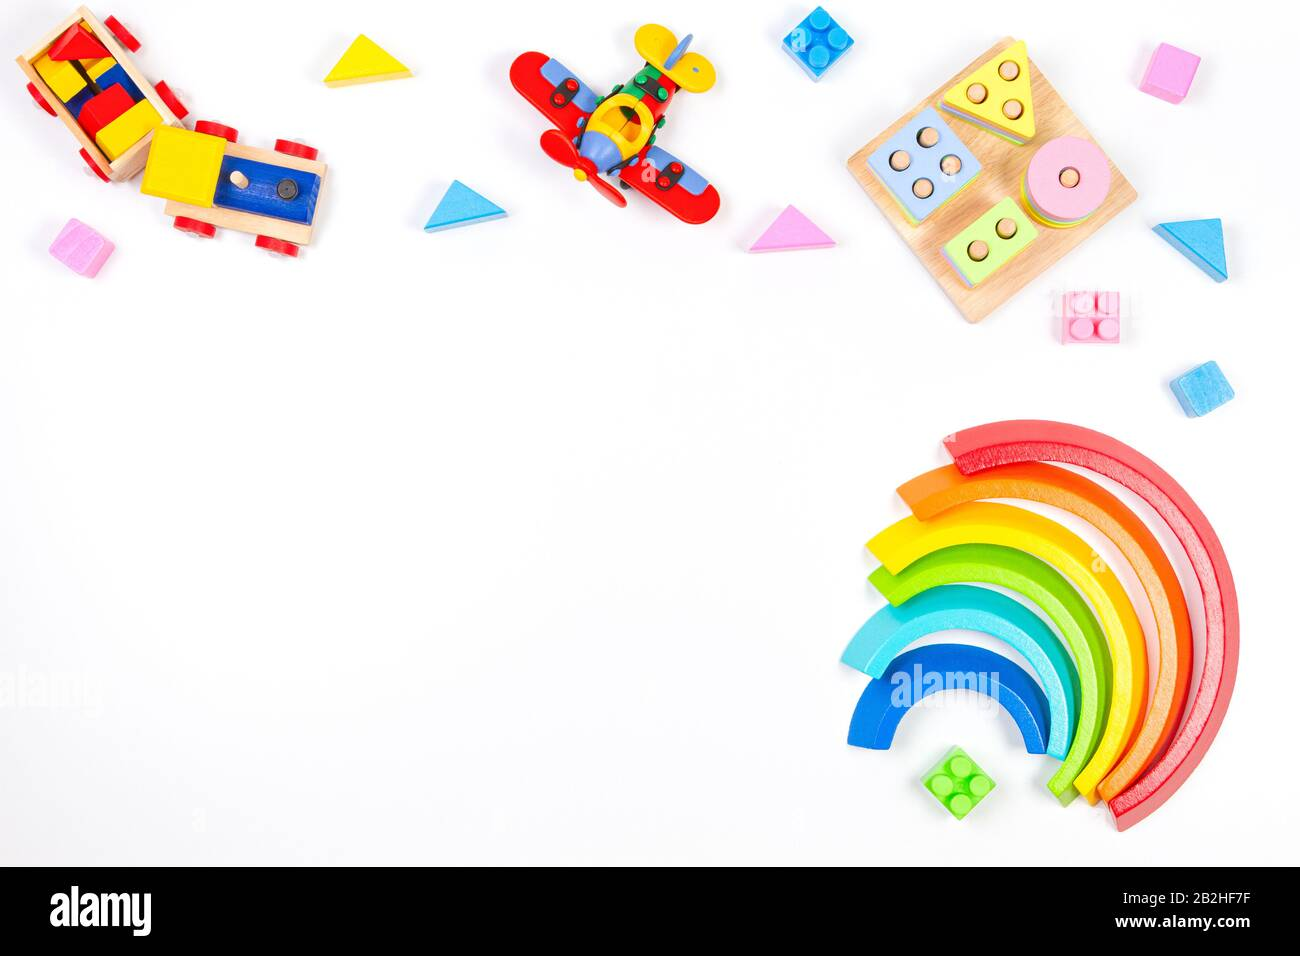 Paddington Bear Educational Stacking Blocks By Rainbow Designs